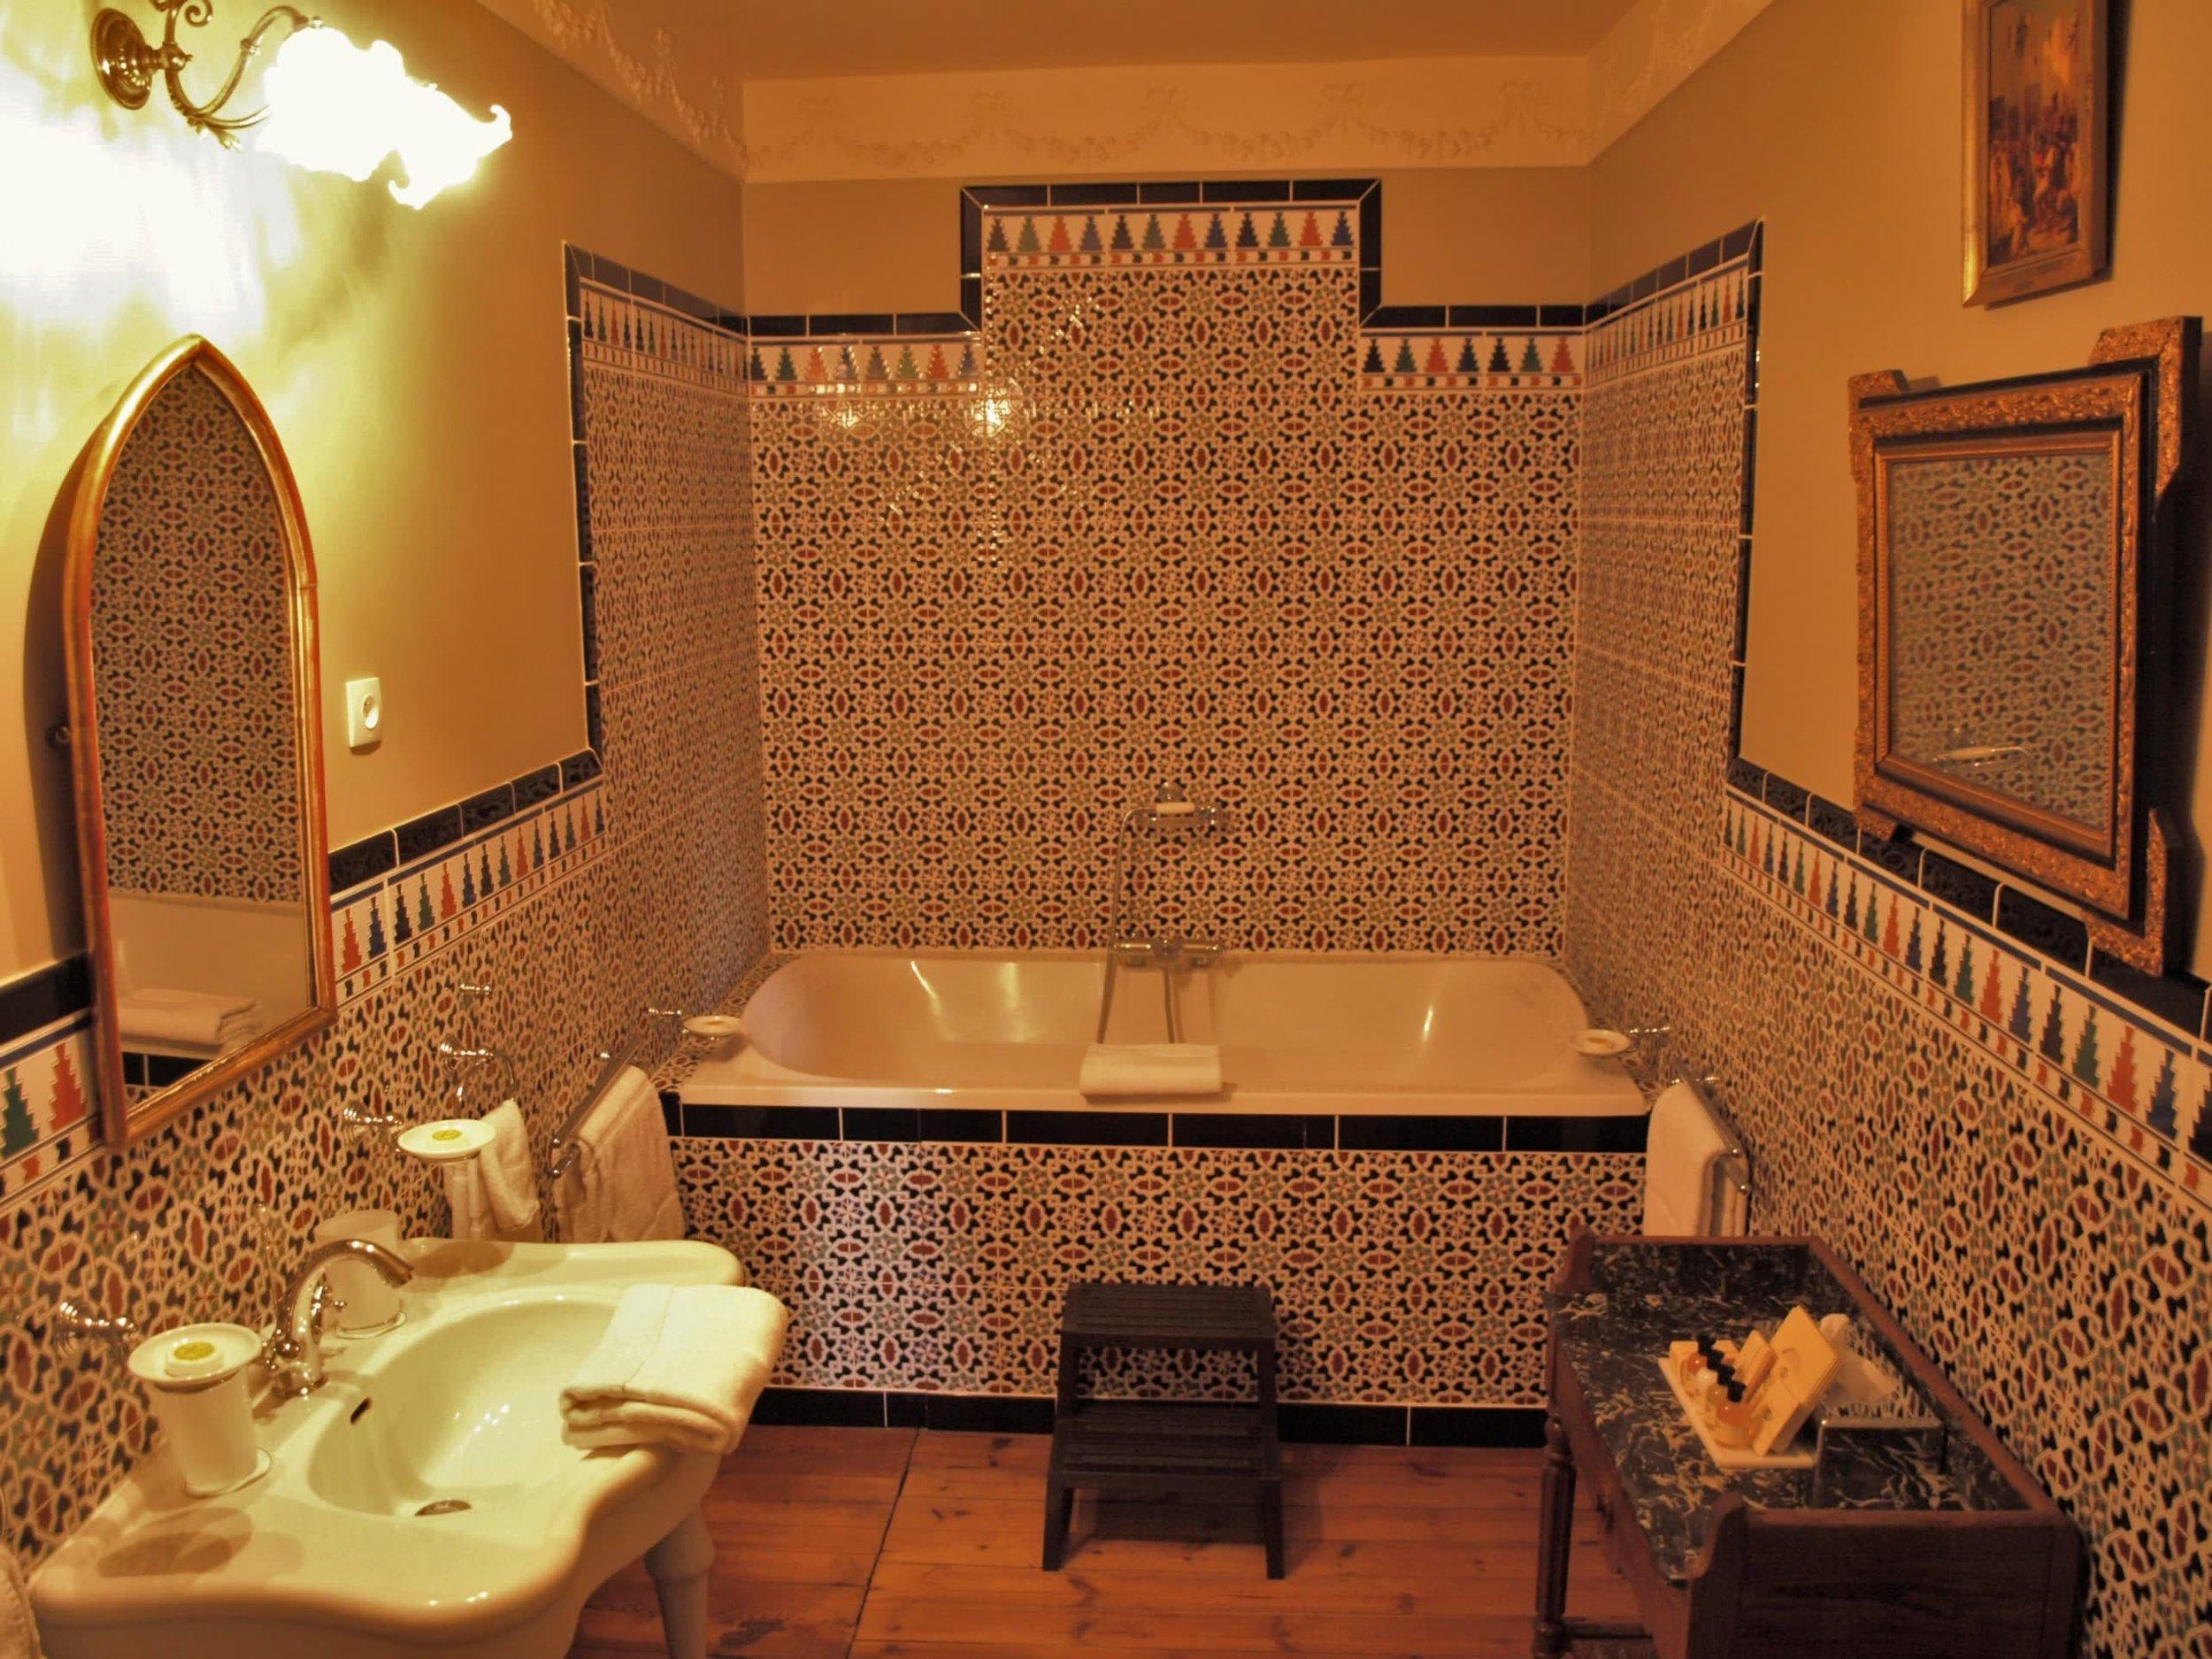 Chateau de la Pommeraye - charming boutique hotel chateau b&b spa normandy calvados bedroom Esquisses 6(2).jpg